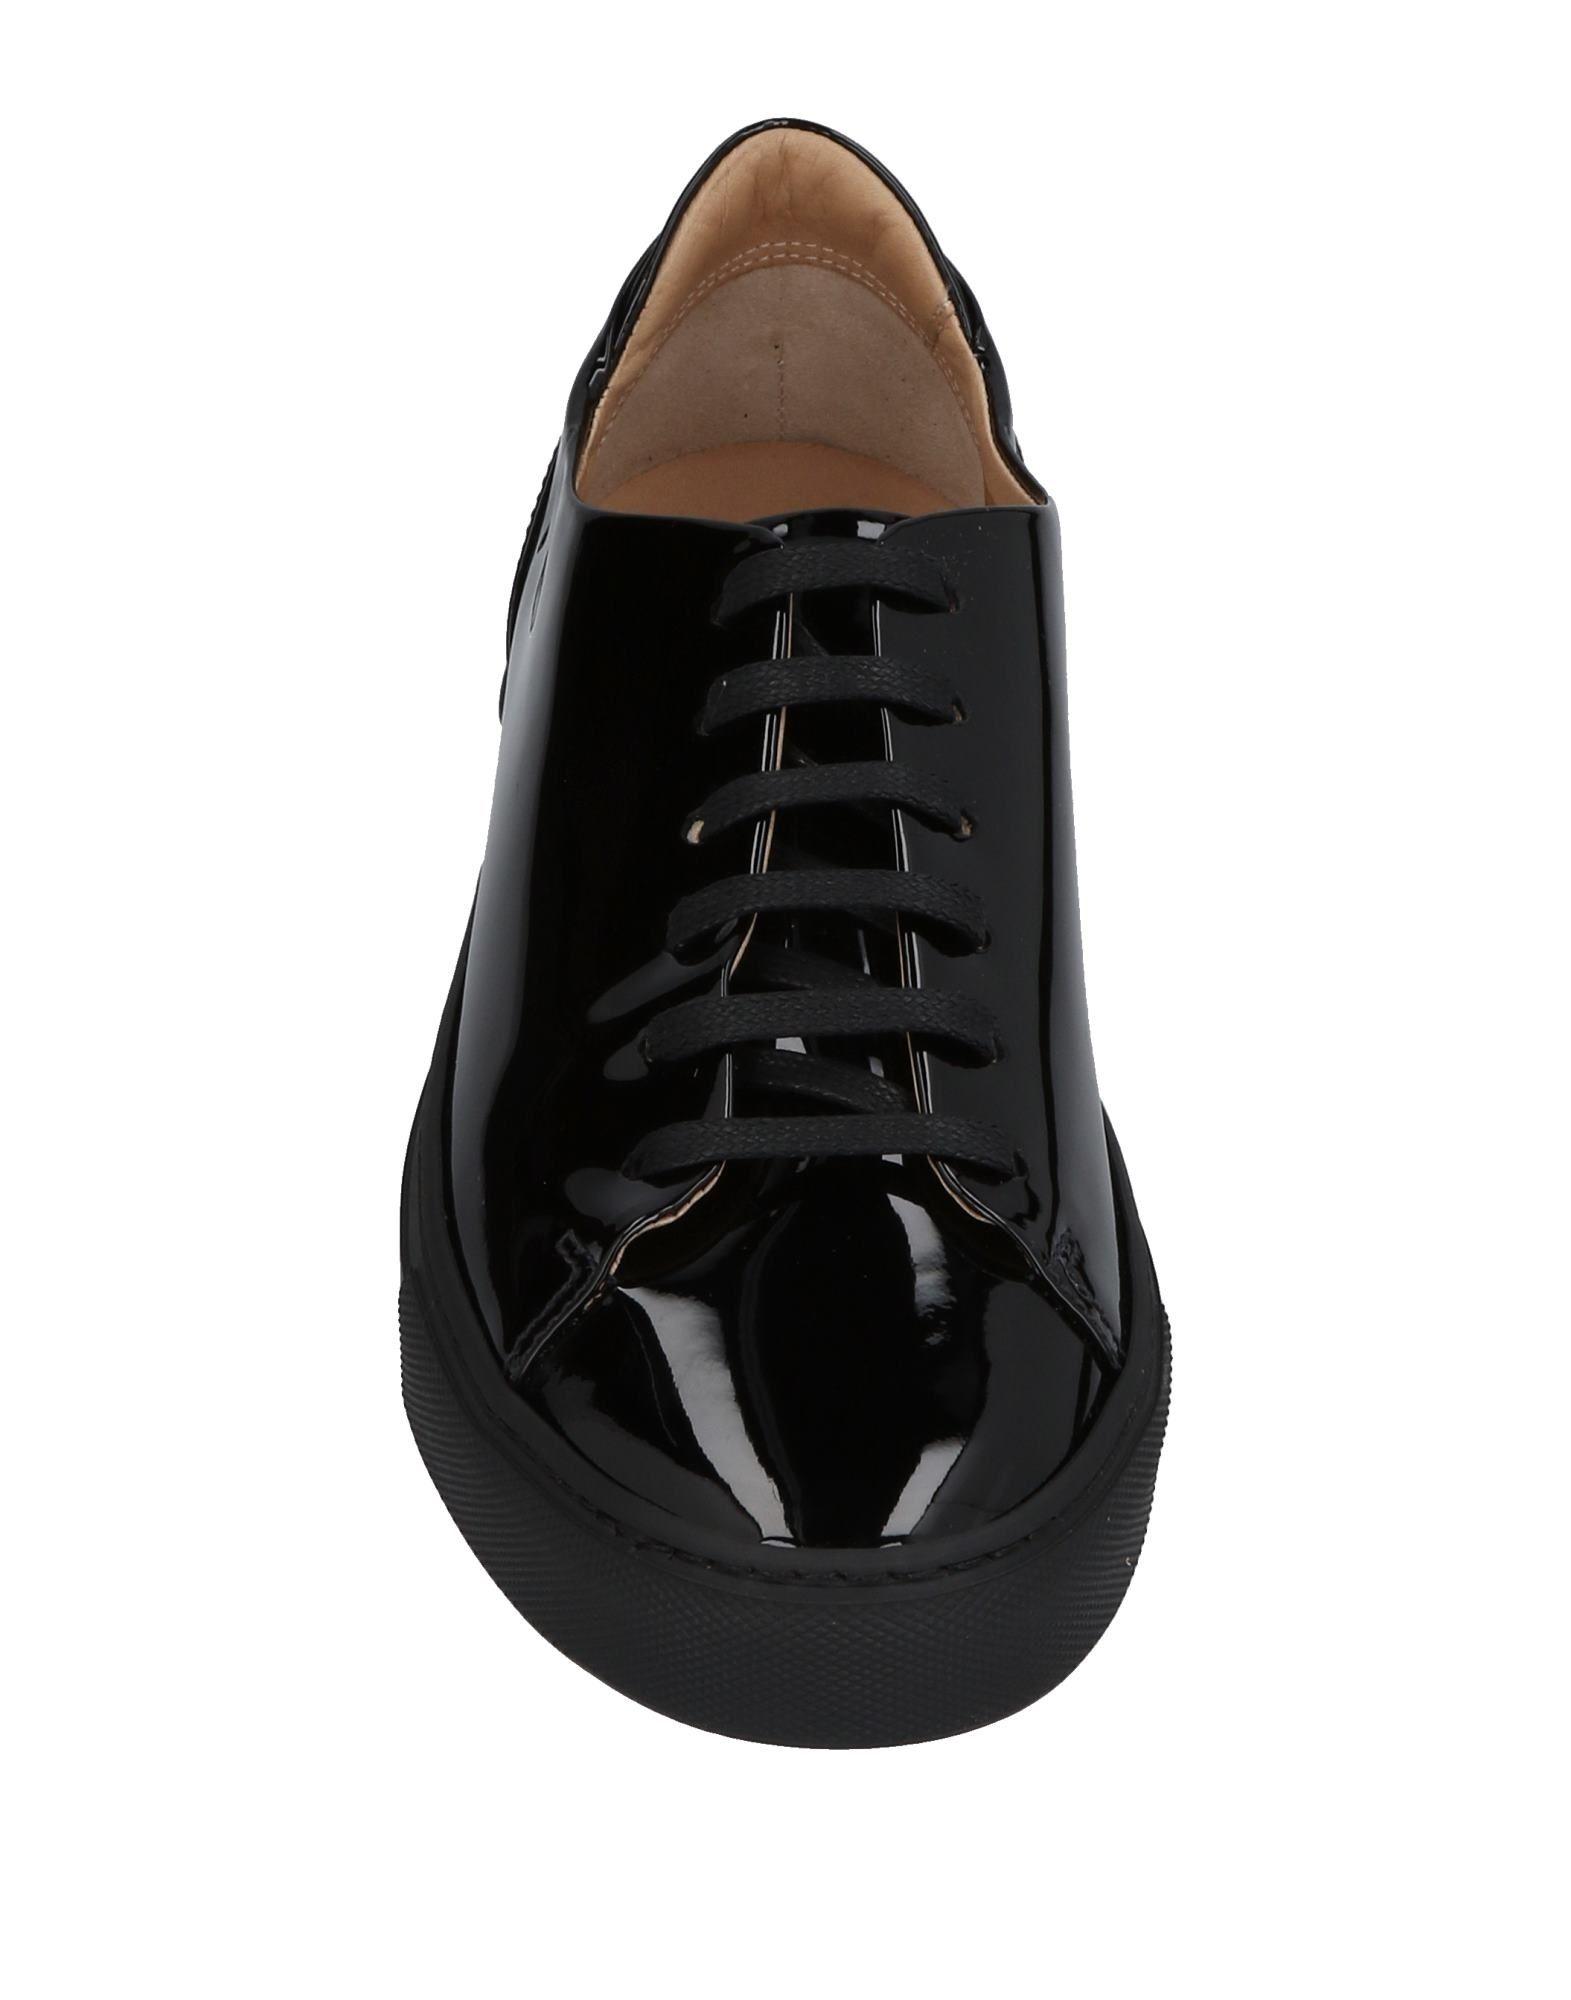 Fratelli Rossetti Sneakers Damen strapazierfähige  11460260MJGut aussehende strapazierfähige Damen Schuhe c1d969